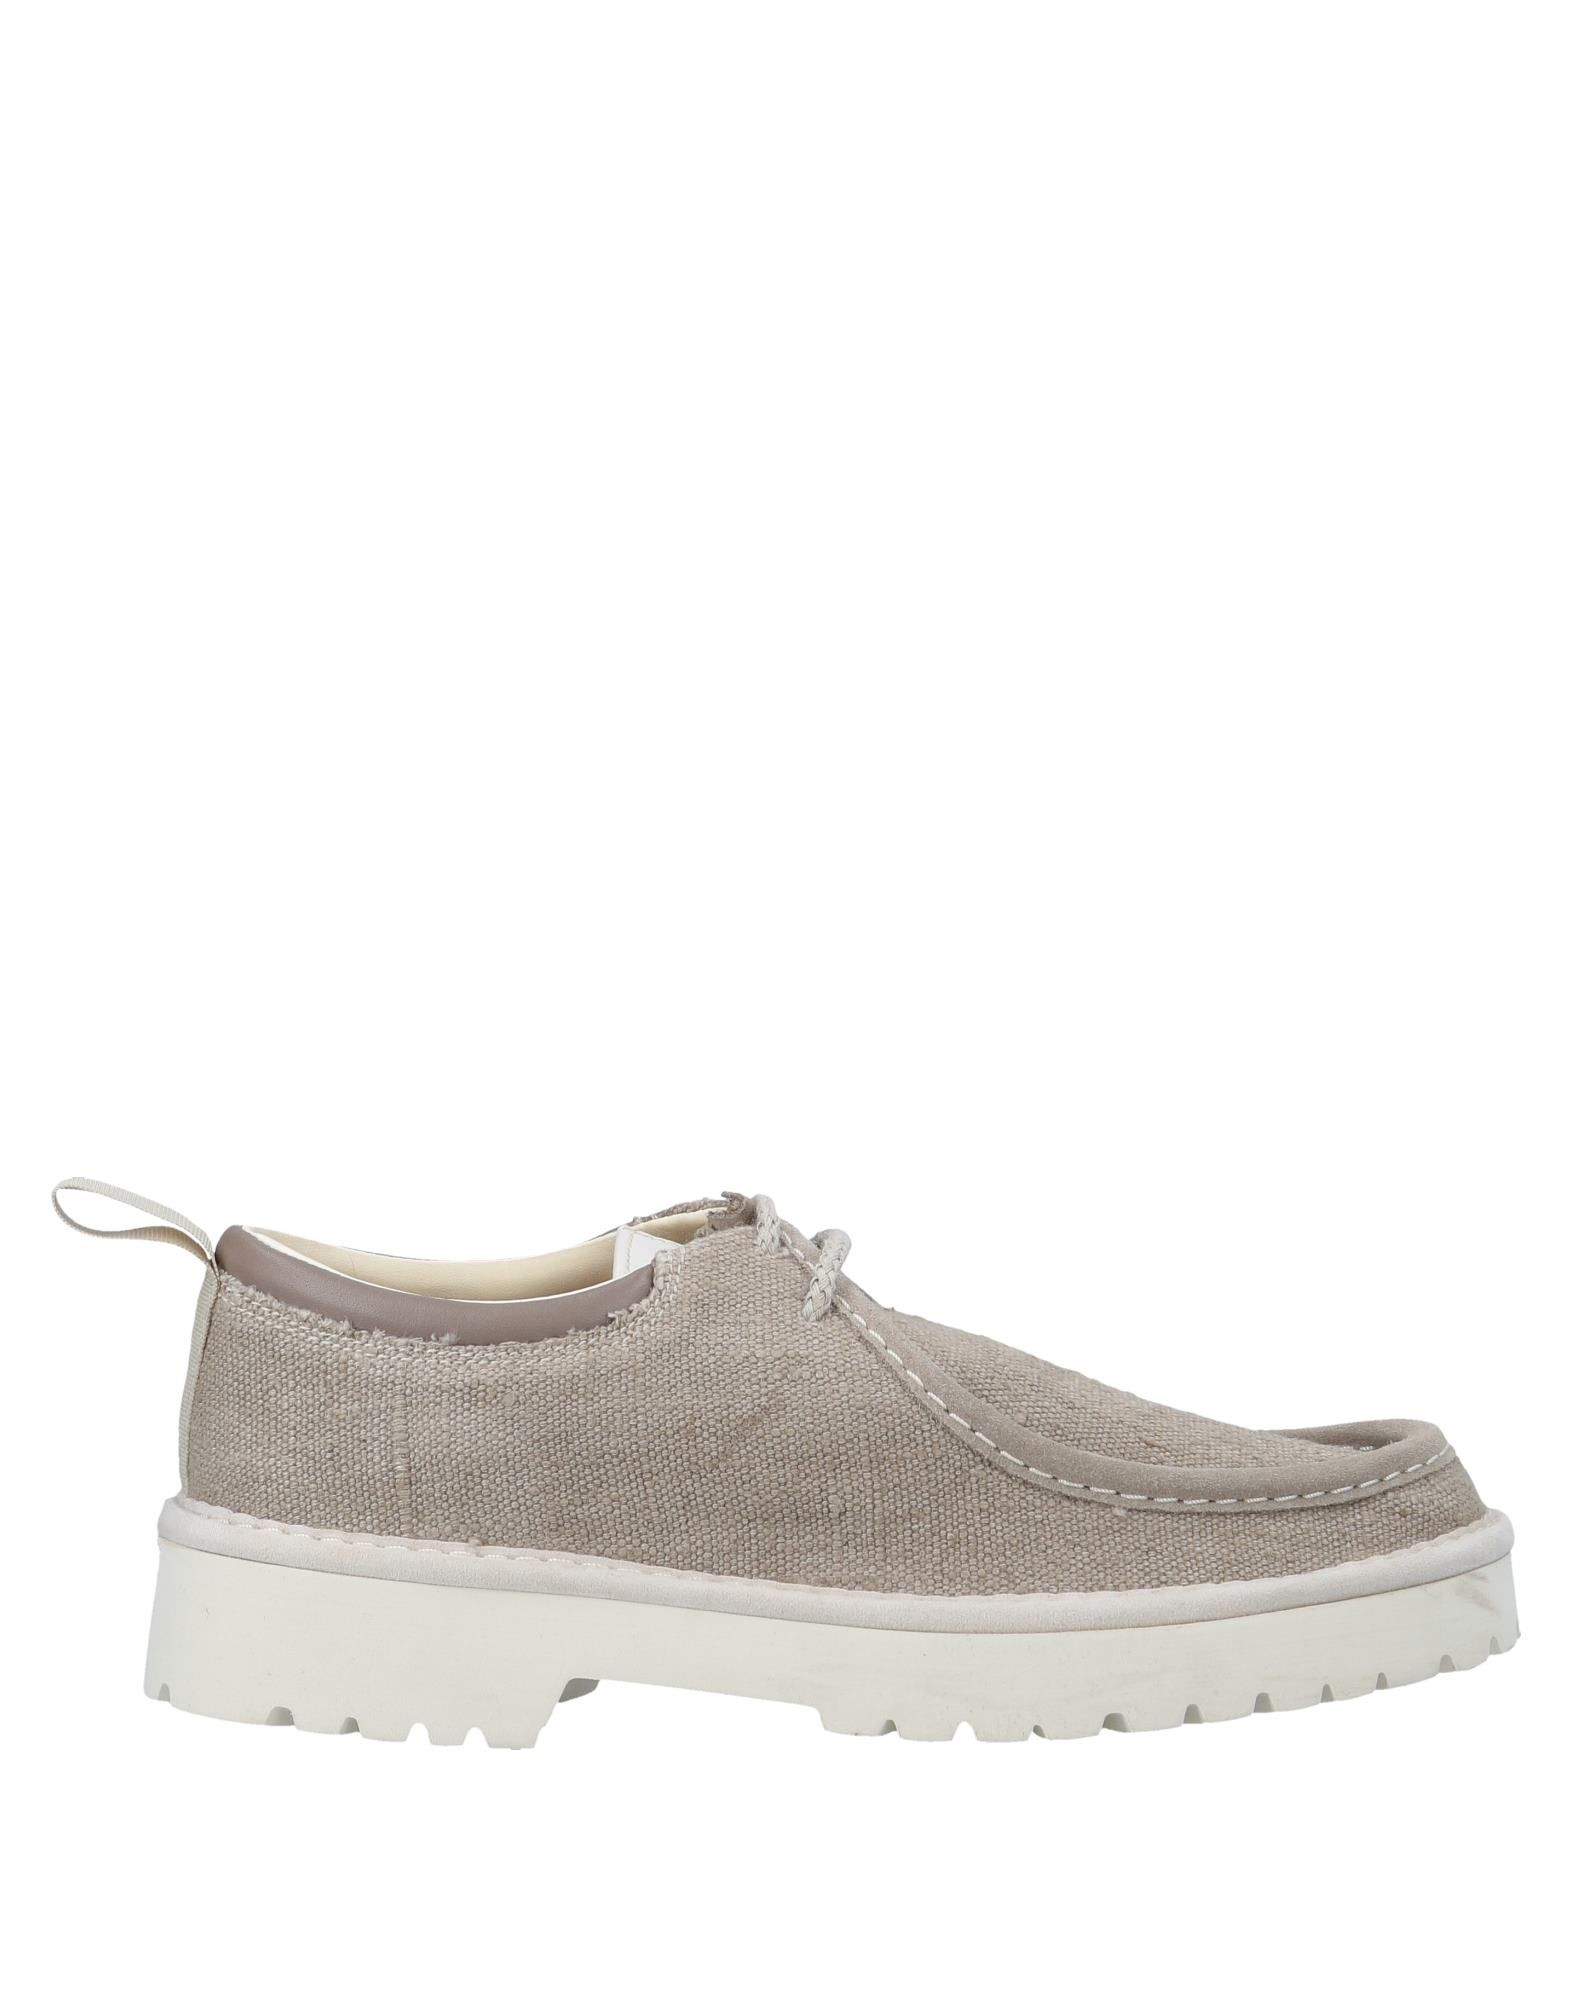 PÀNCHIC Обувь на шнурках цены онлайн